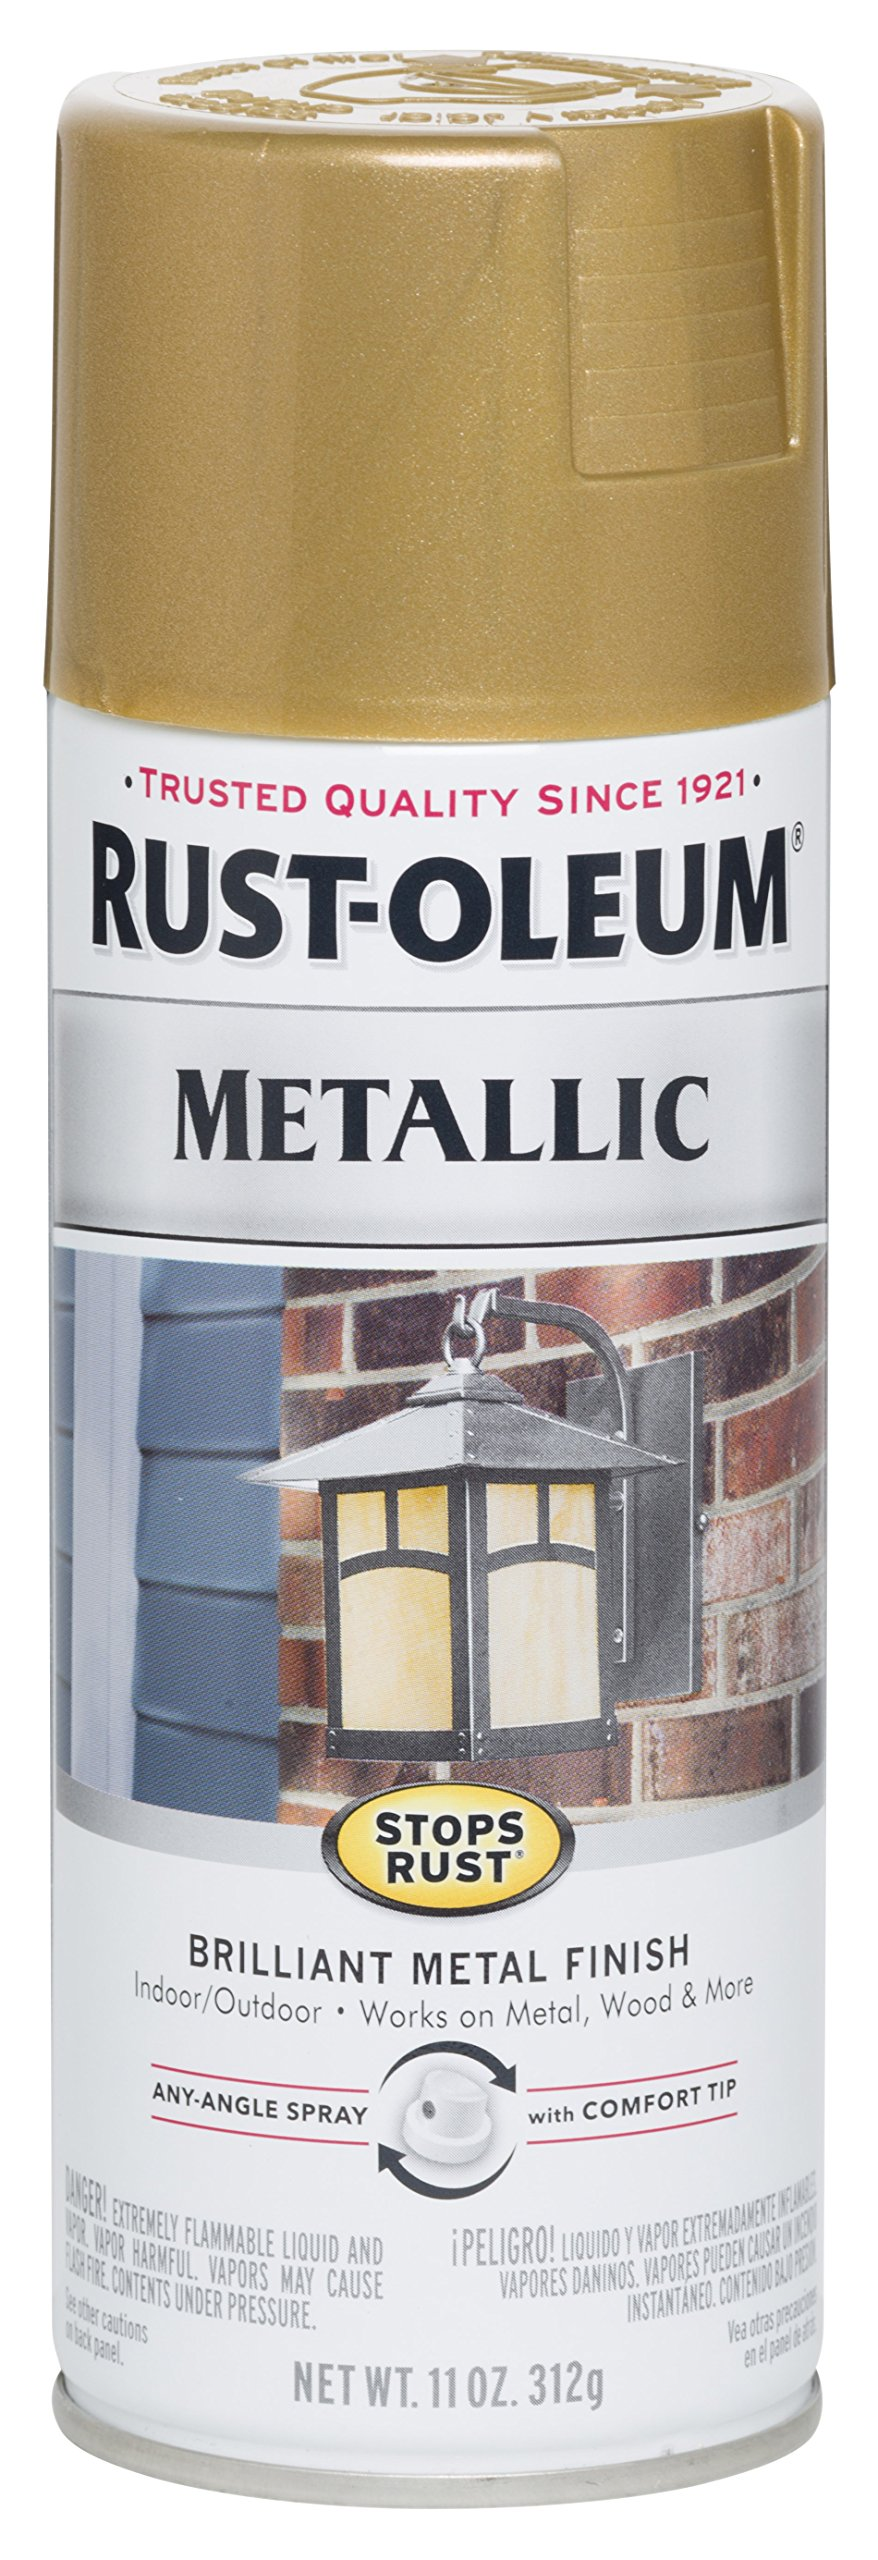 Rust-Oleum 7270830 Stops Rust Metallic Spray Paint, 11 oz, Gold Rush